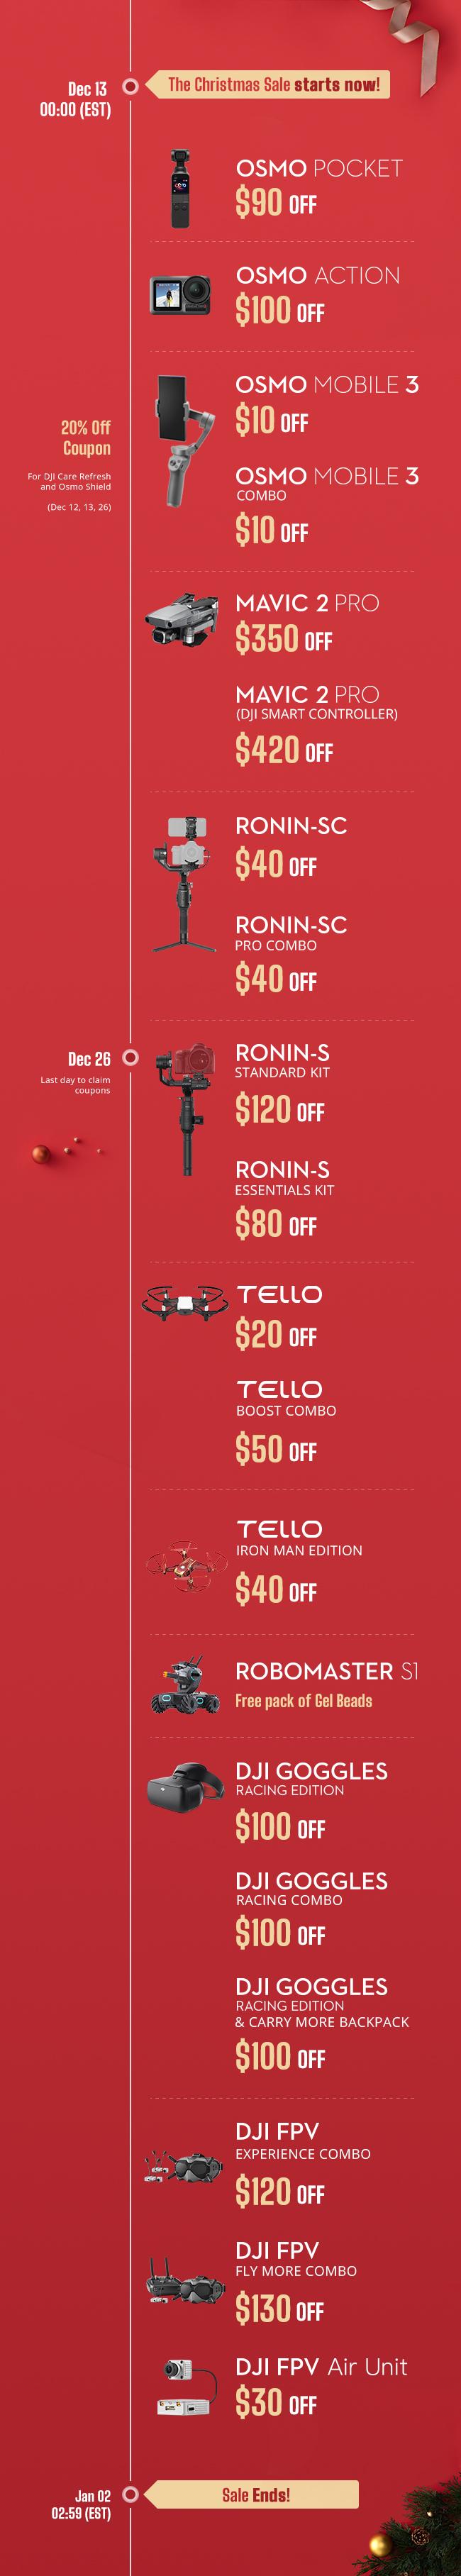 DJI Christmas sale timeline